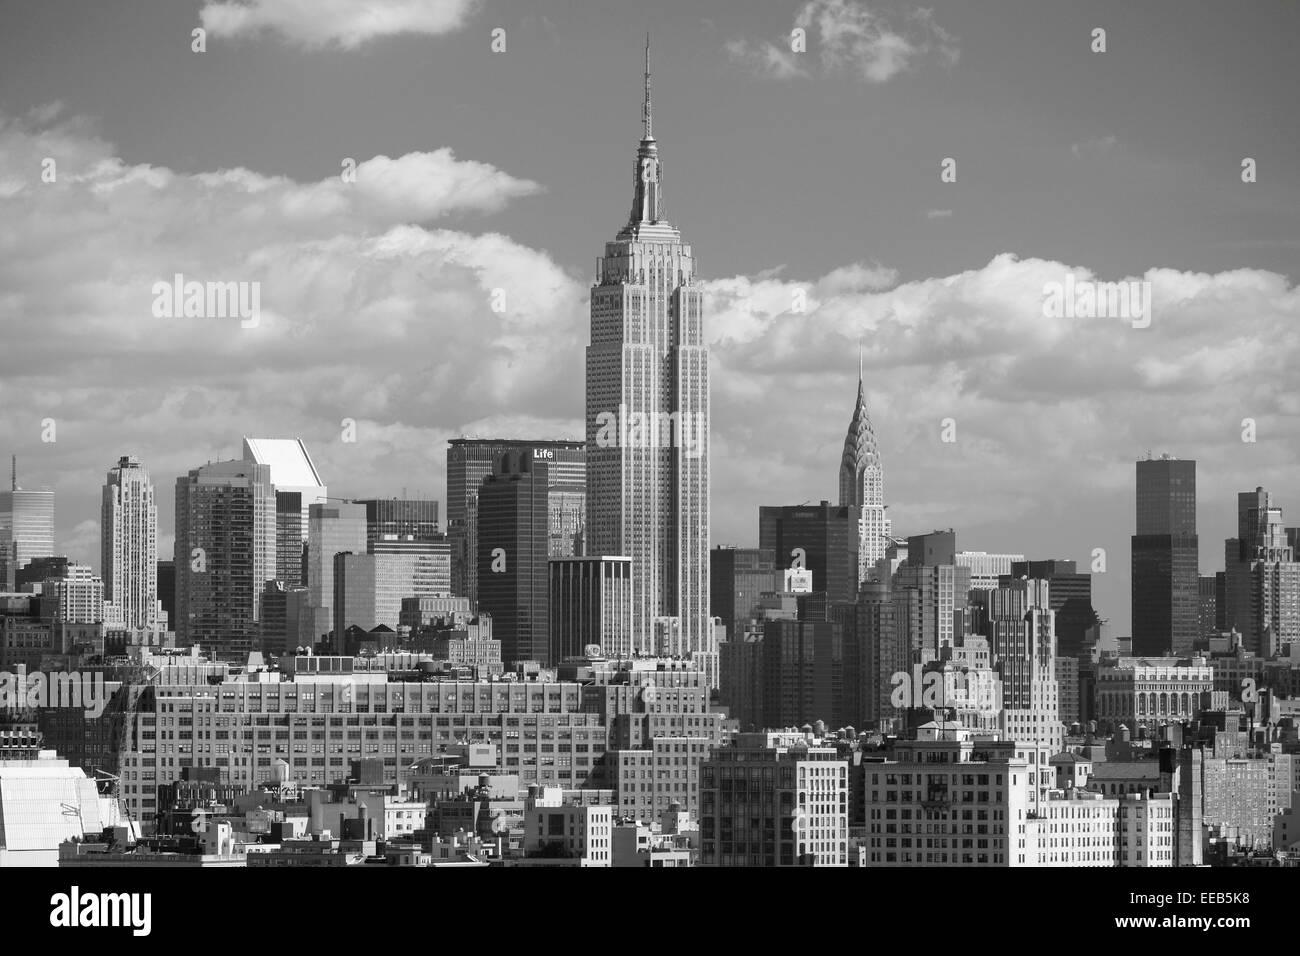 Empire state building, Midtown, New York, USA - Stock Image